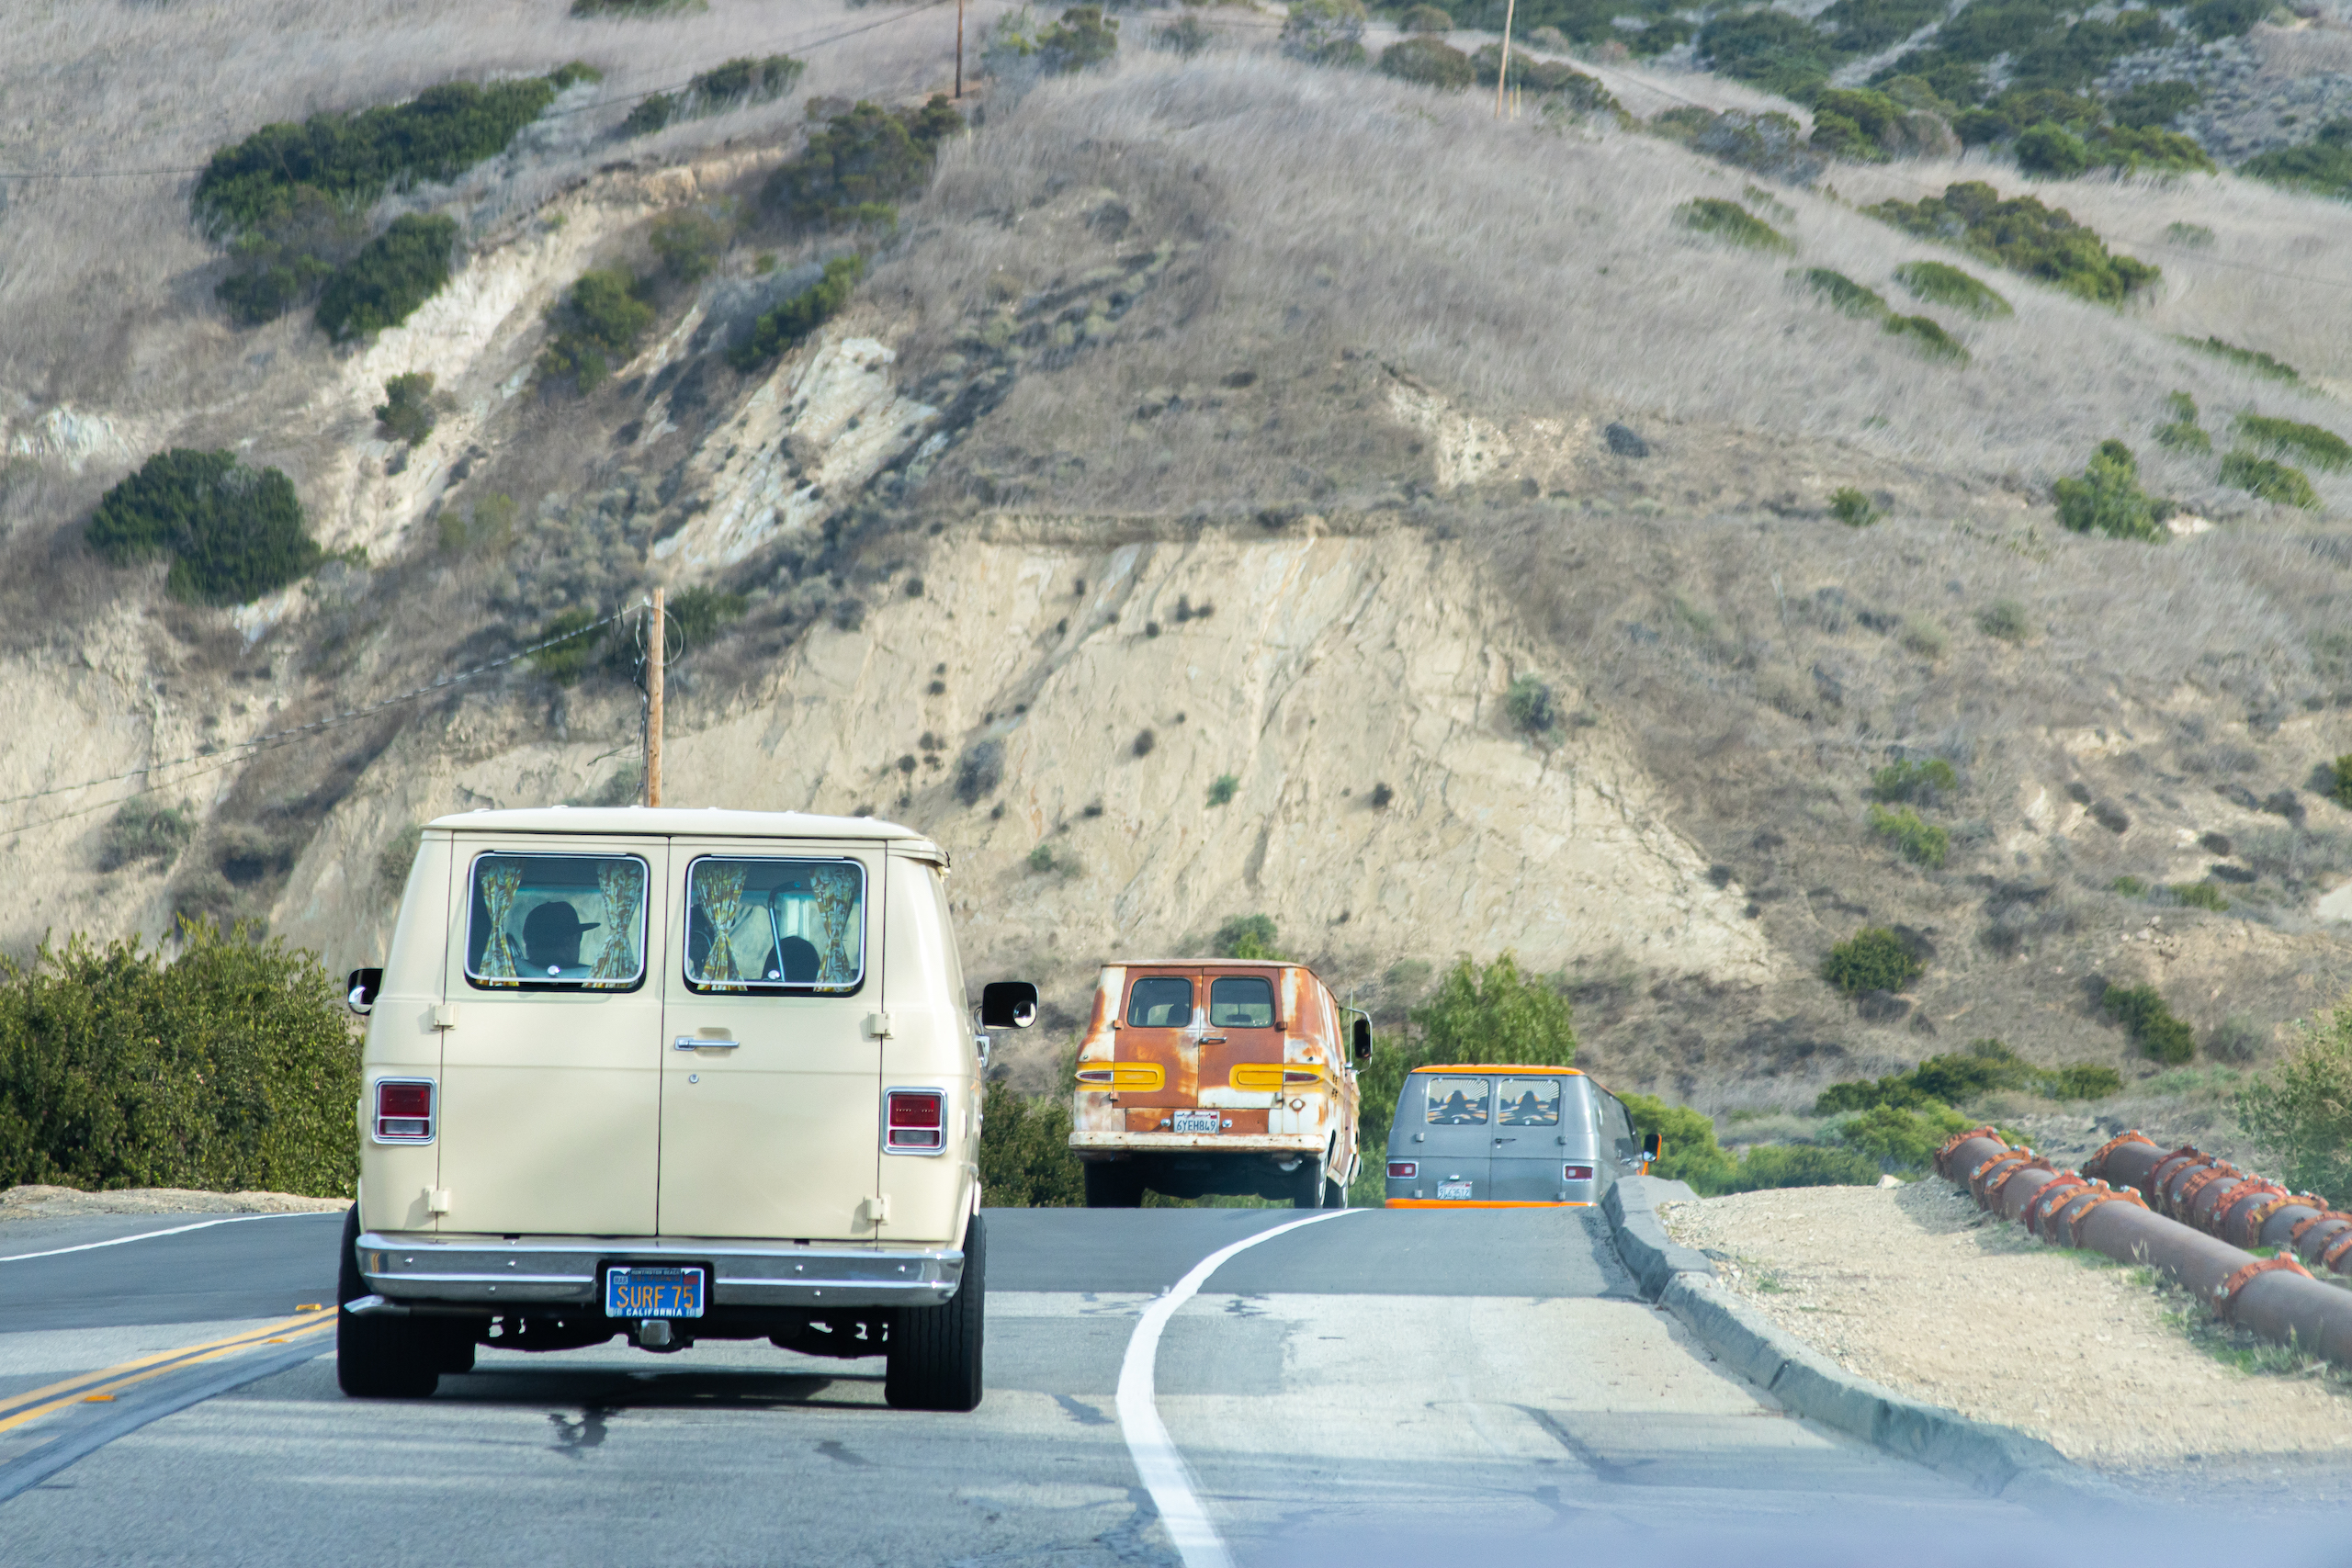 So-Cal Slow Ride Van Run on the road rear